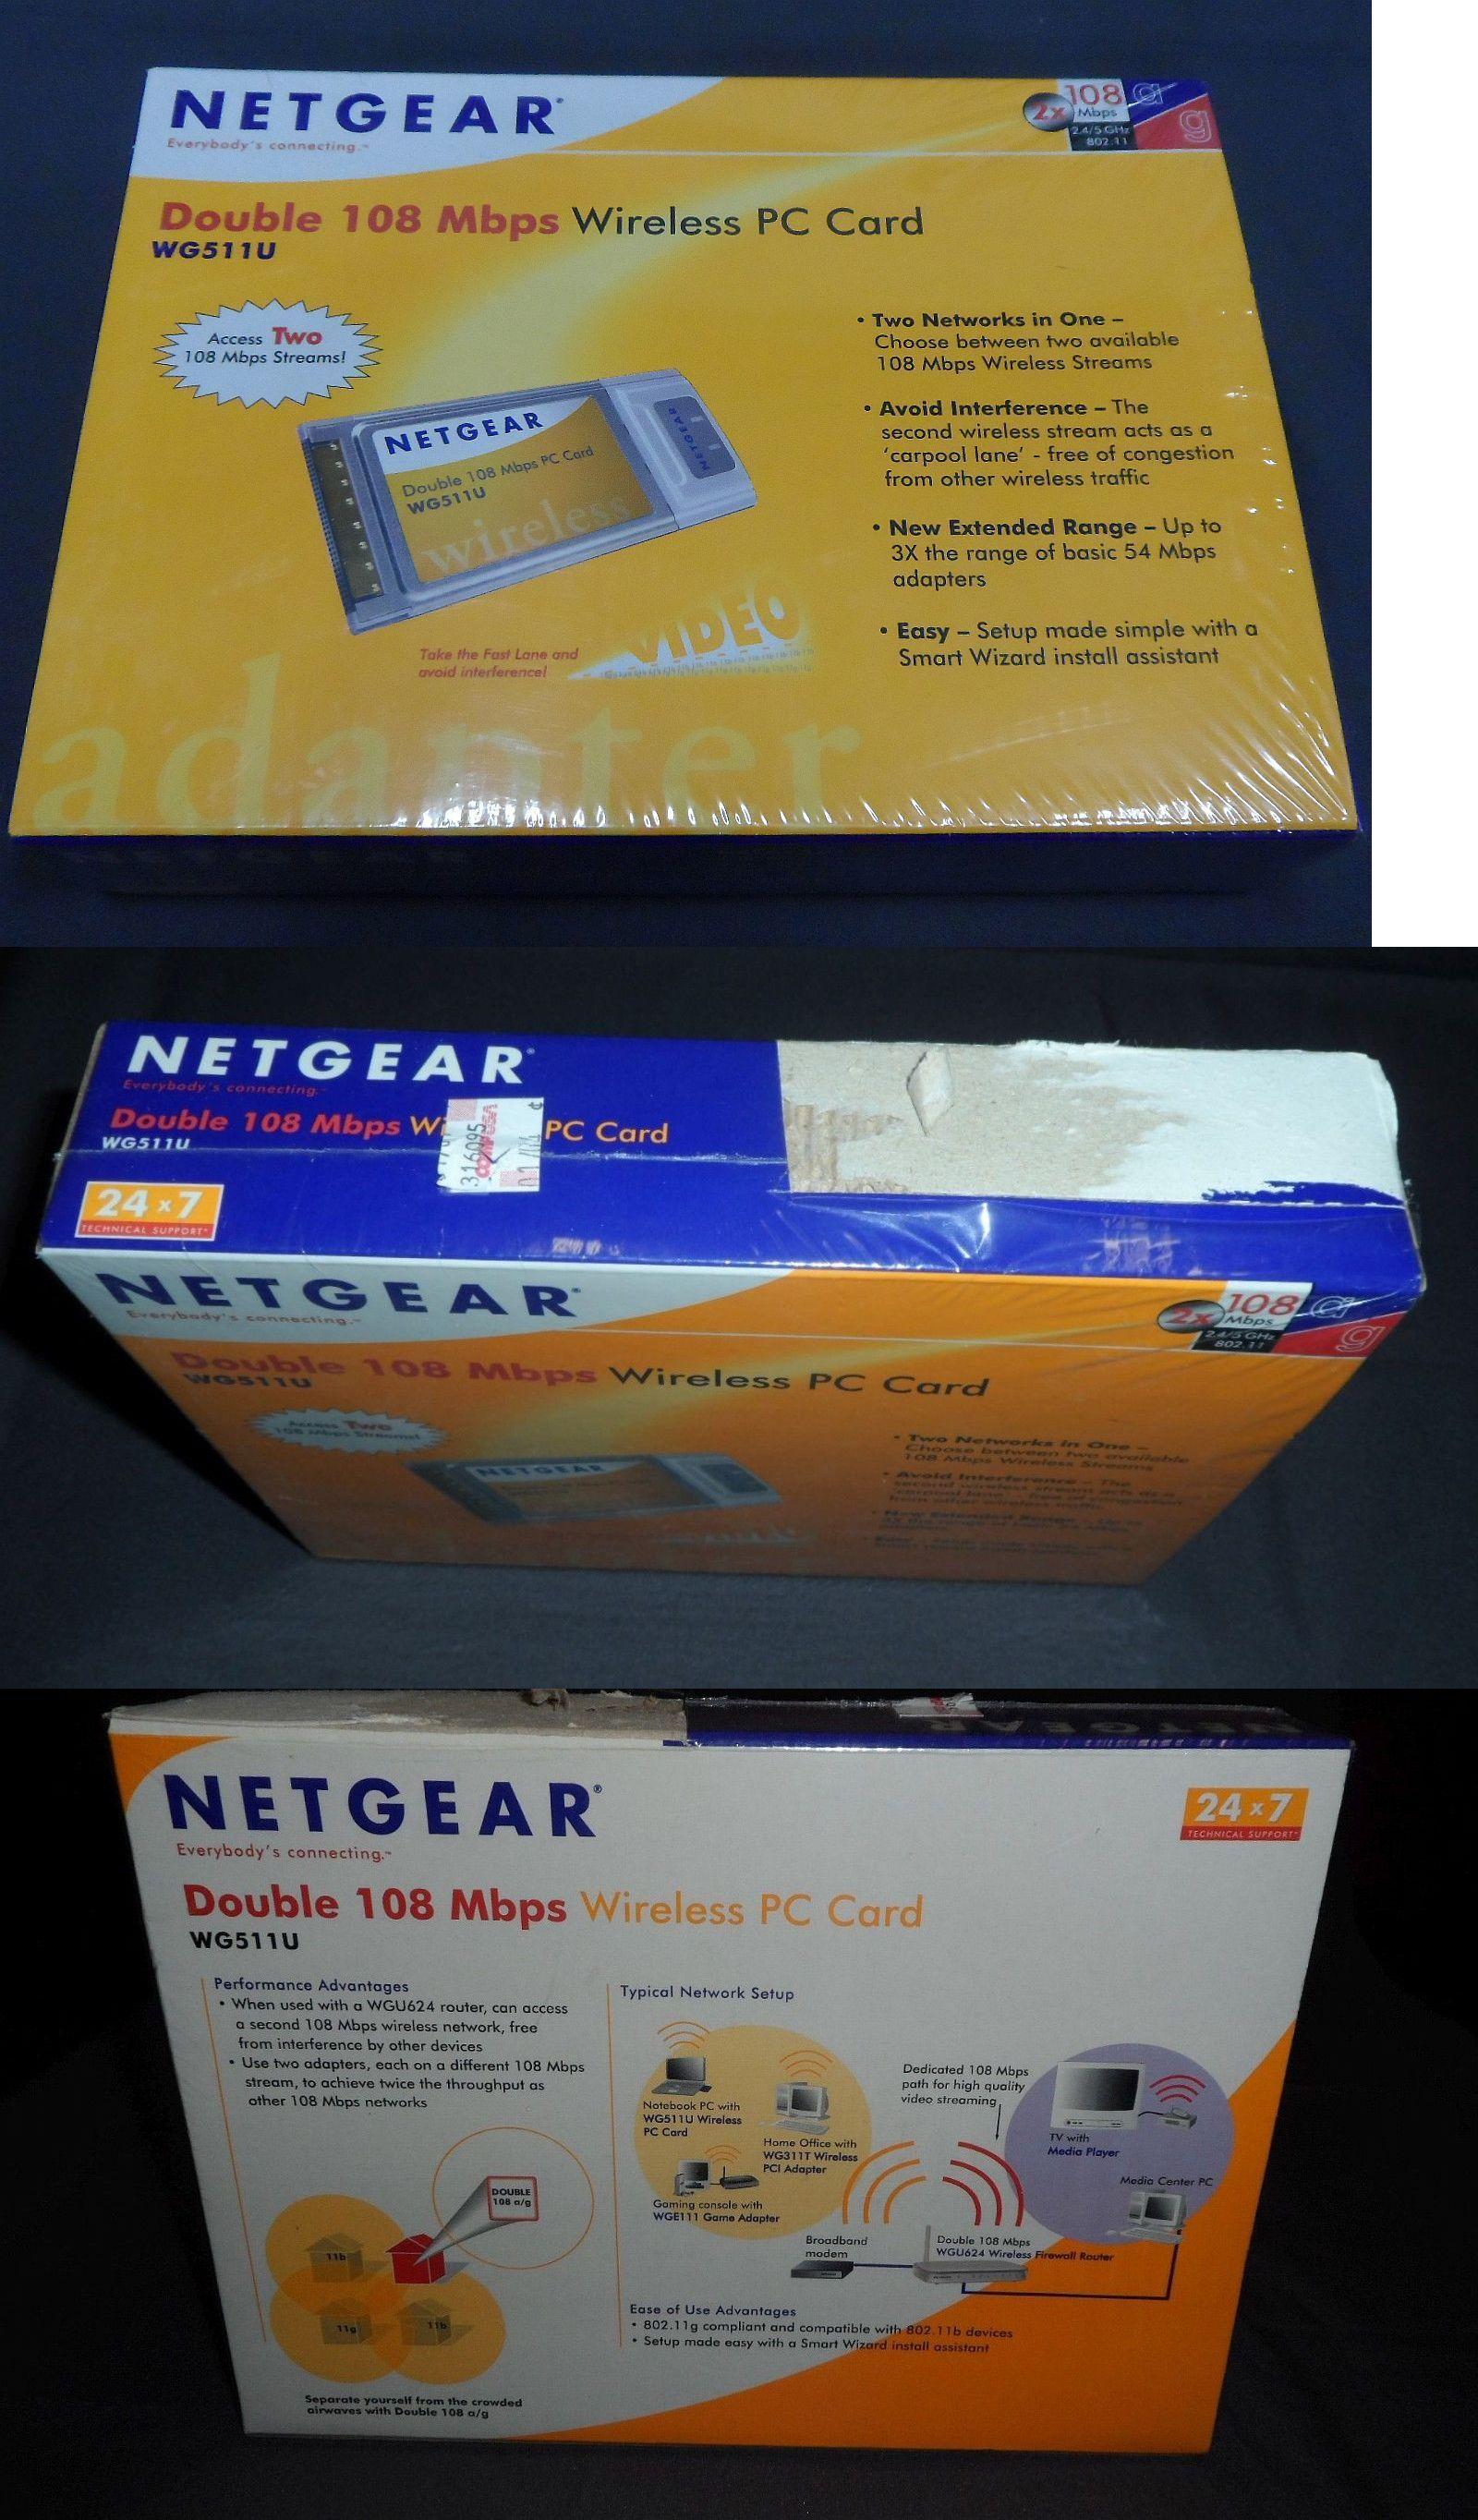 NETGEAR WG511U NETWORK CARD WIRELESS WINDOWS 8.1 DRIVER DOWNLOAD